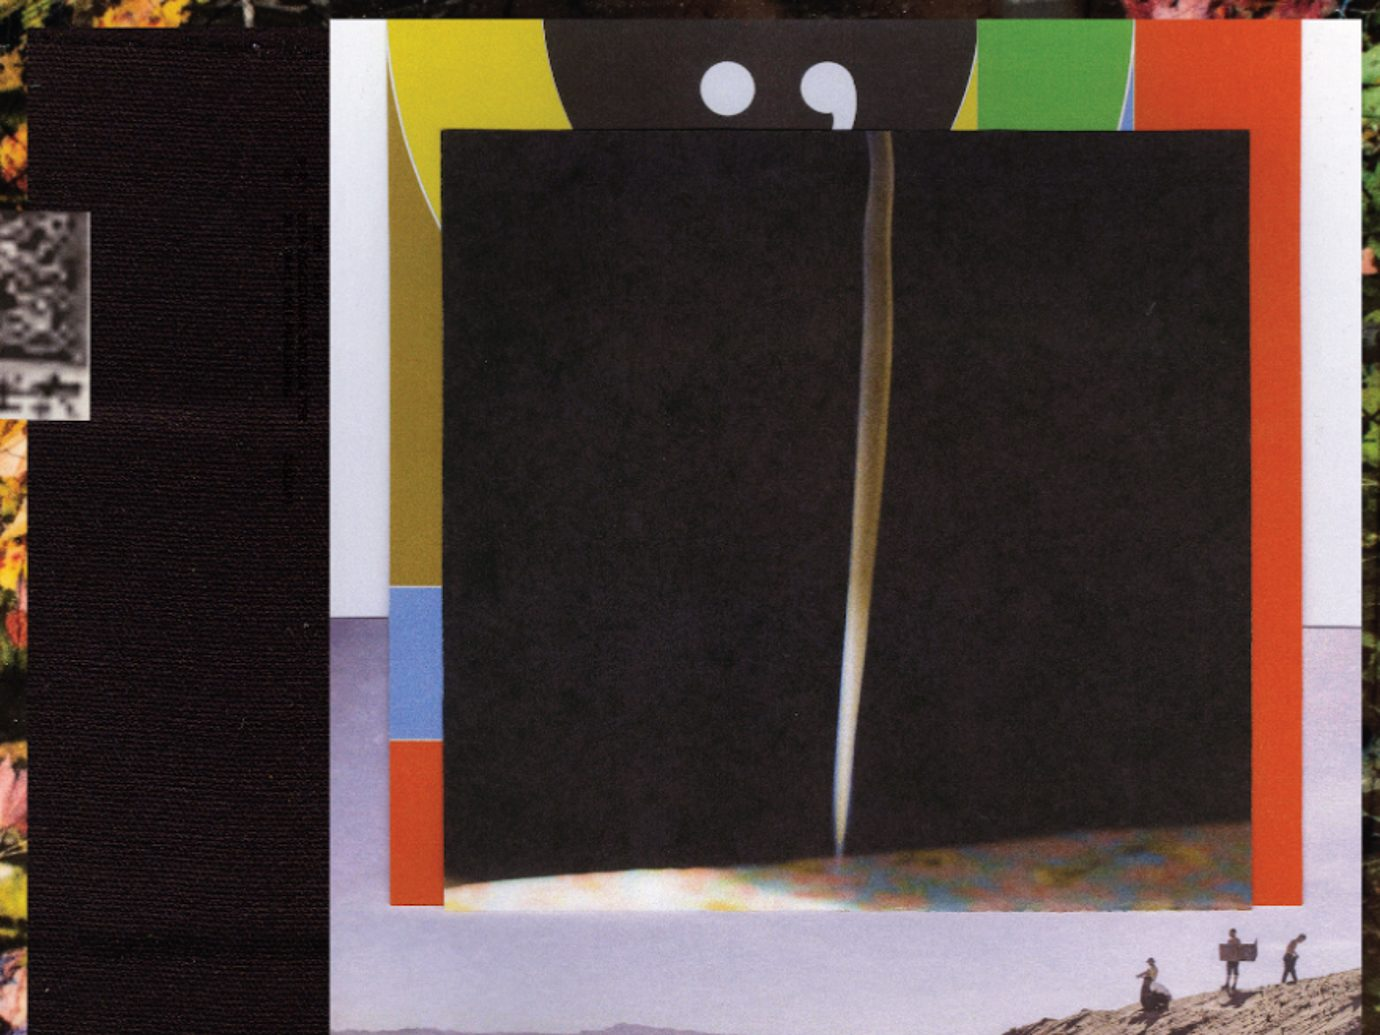 Album der Woche: Bon Iver – i,i